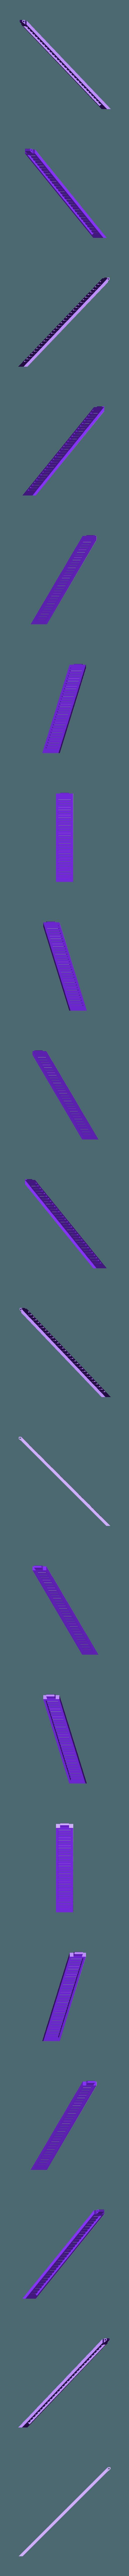 rampes scx24 rampe h120 45 deg.STL Download STL file AXIAL SCX24 mini or micro crawler Bridge 100 mm • Object to 3D print, lulu3Dbuilder